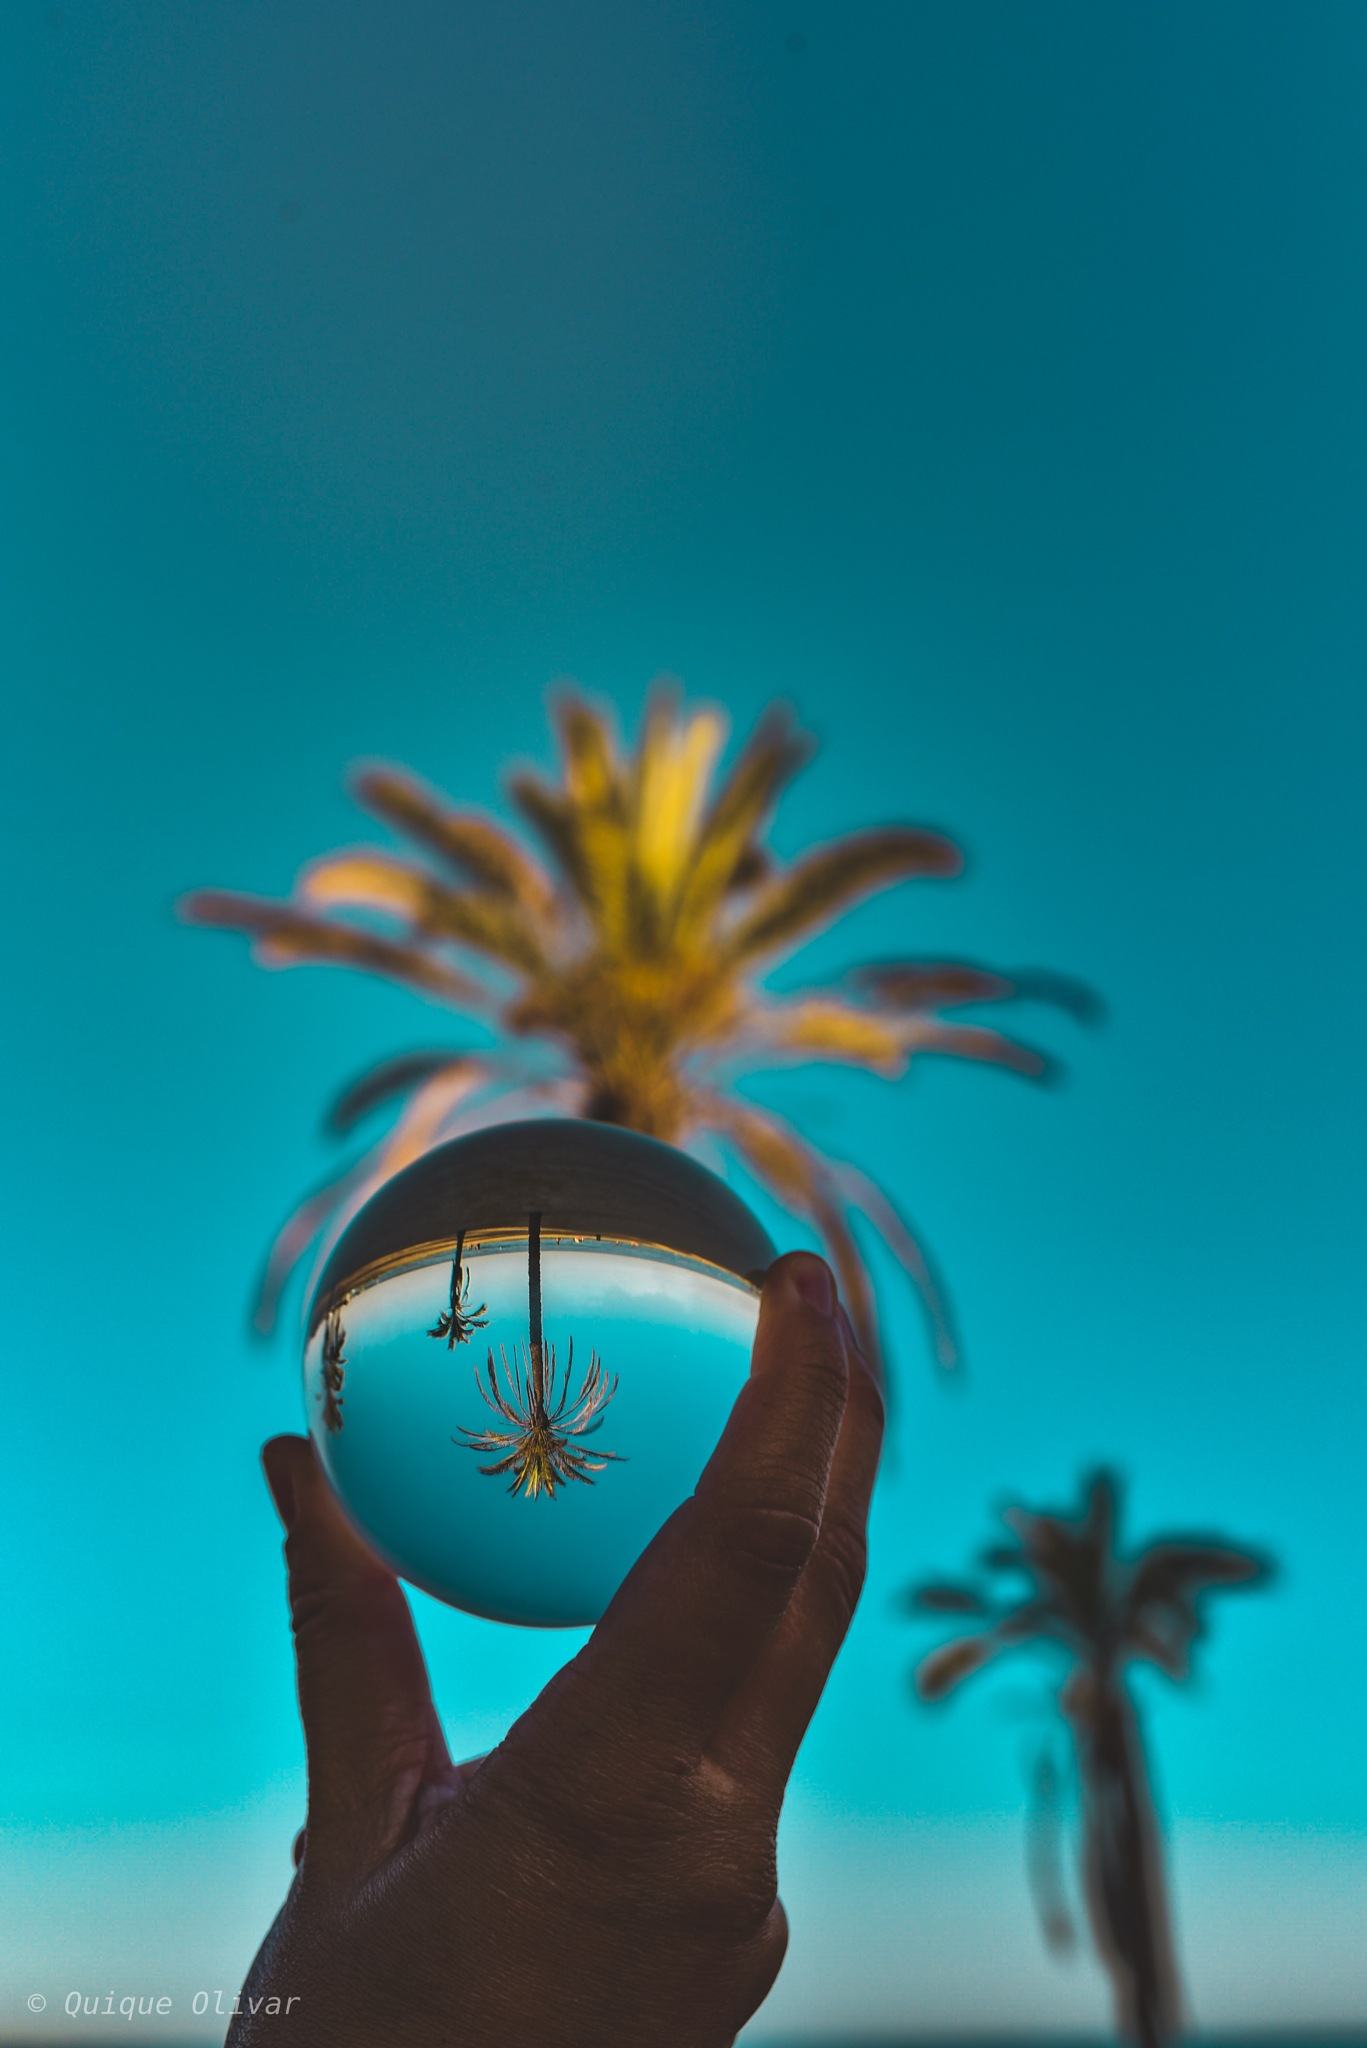 LensBall by Quique_olivar